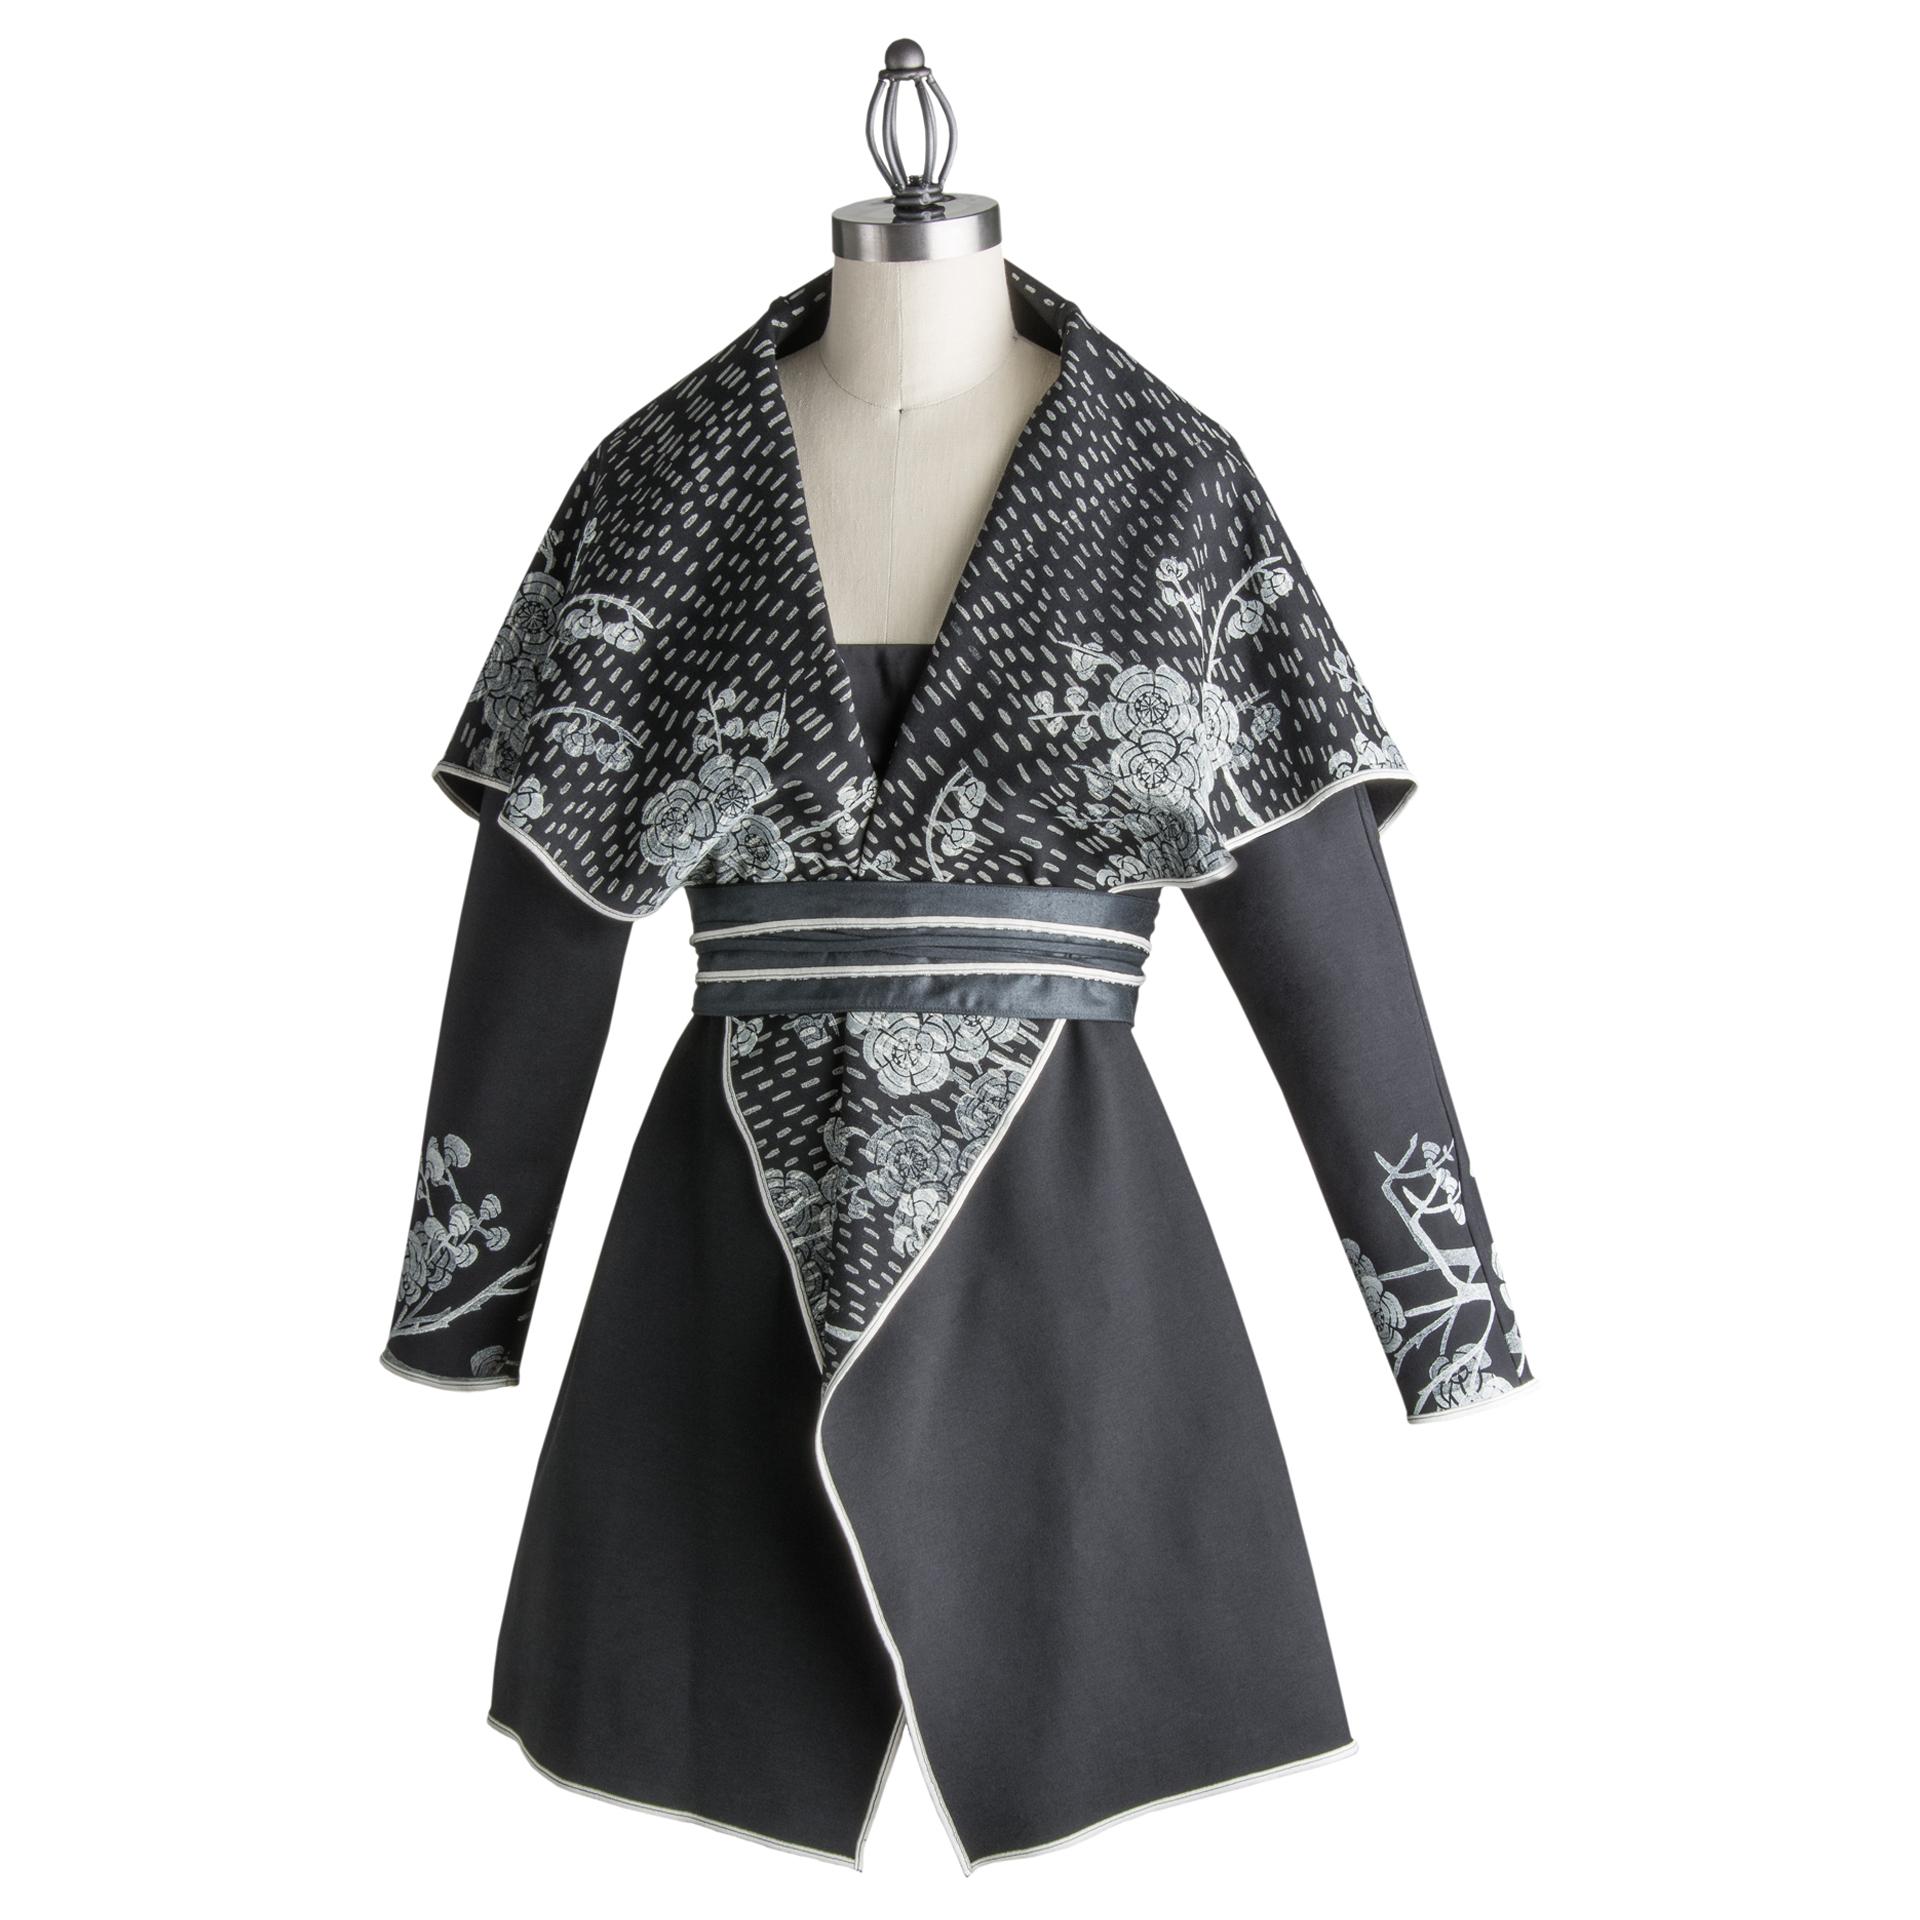 Hand carved linoleum blocks, hand printed on ponte knit fabric. Black jacket.